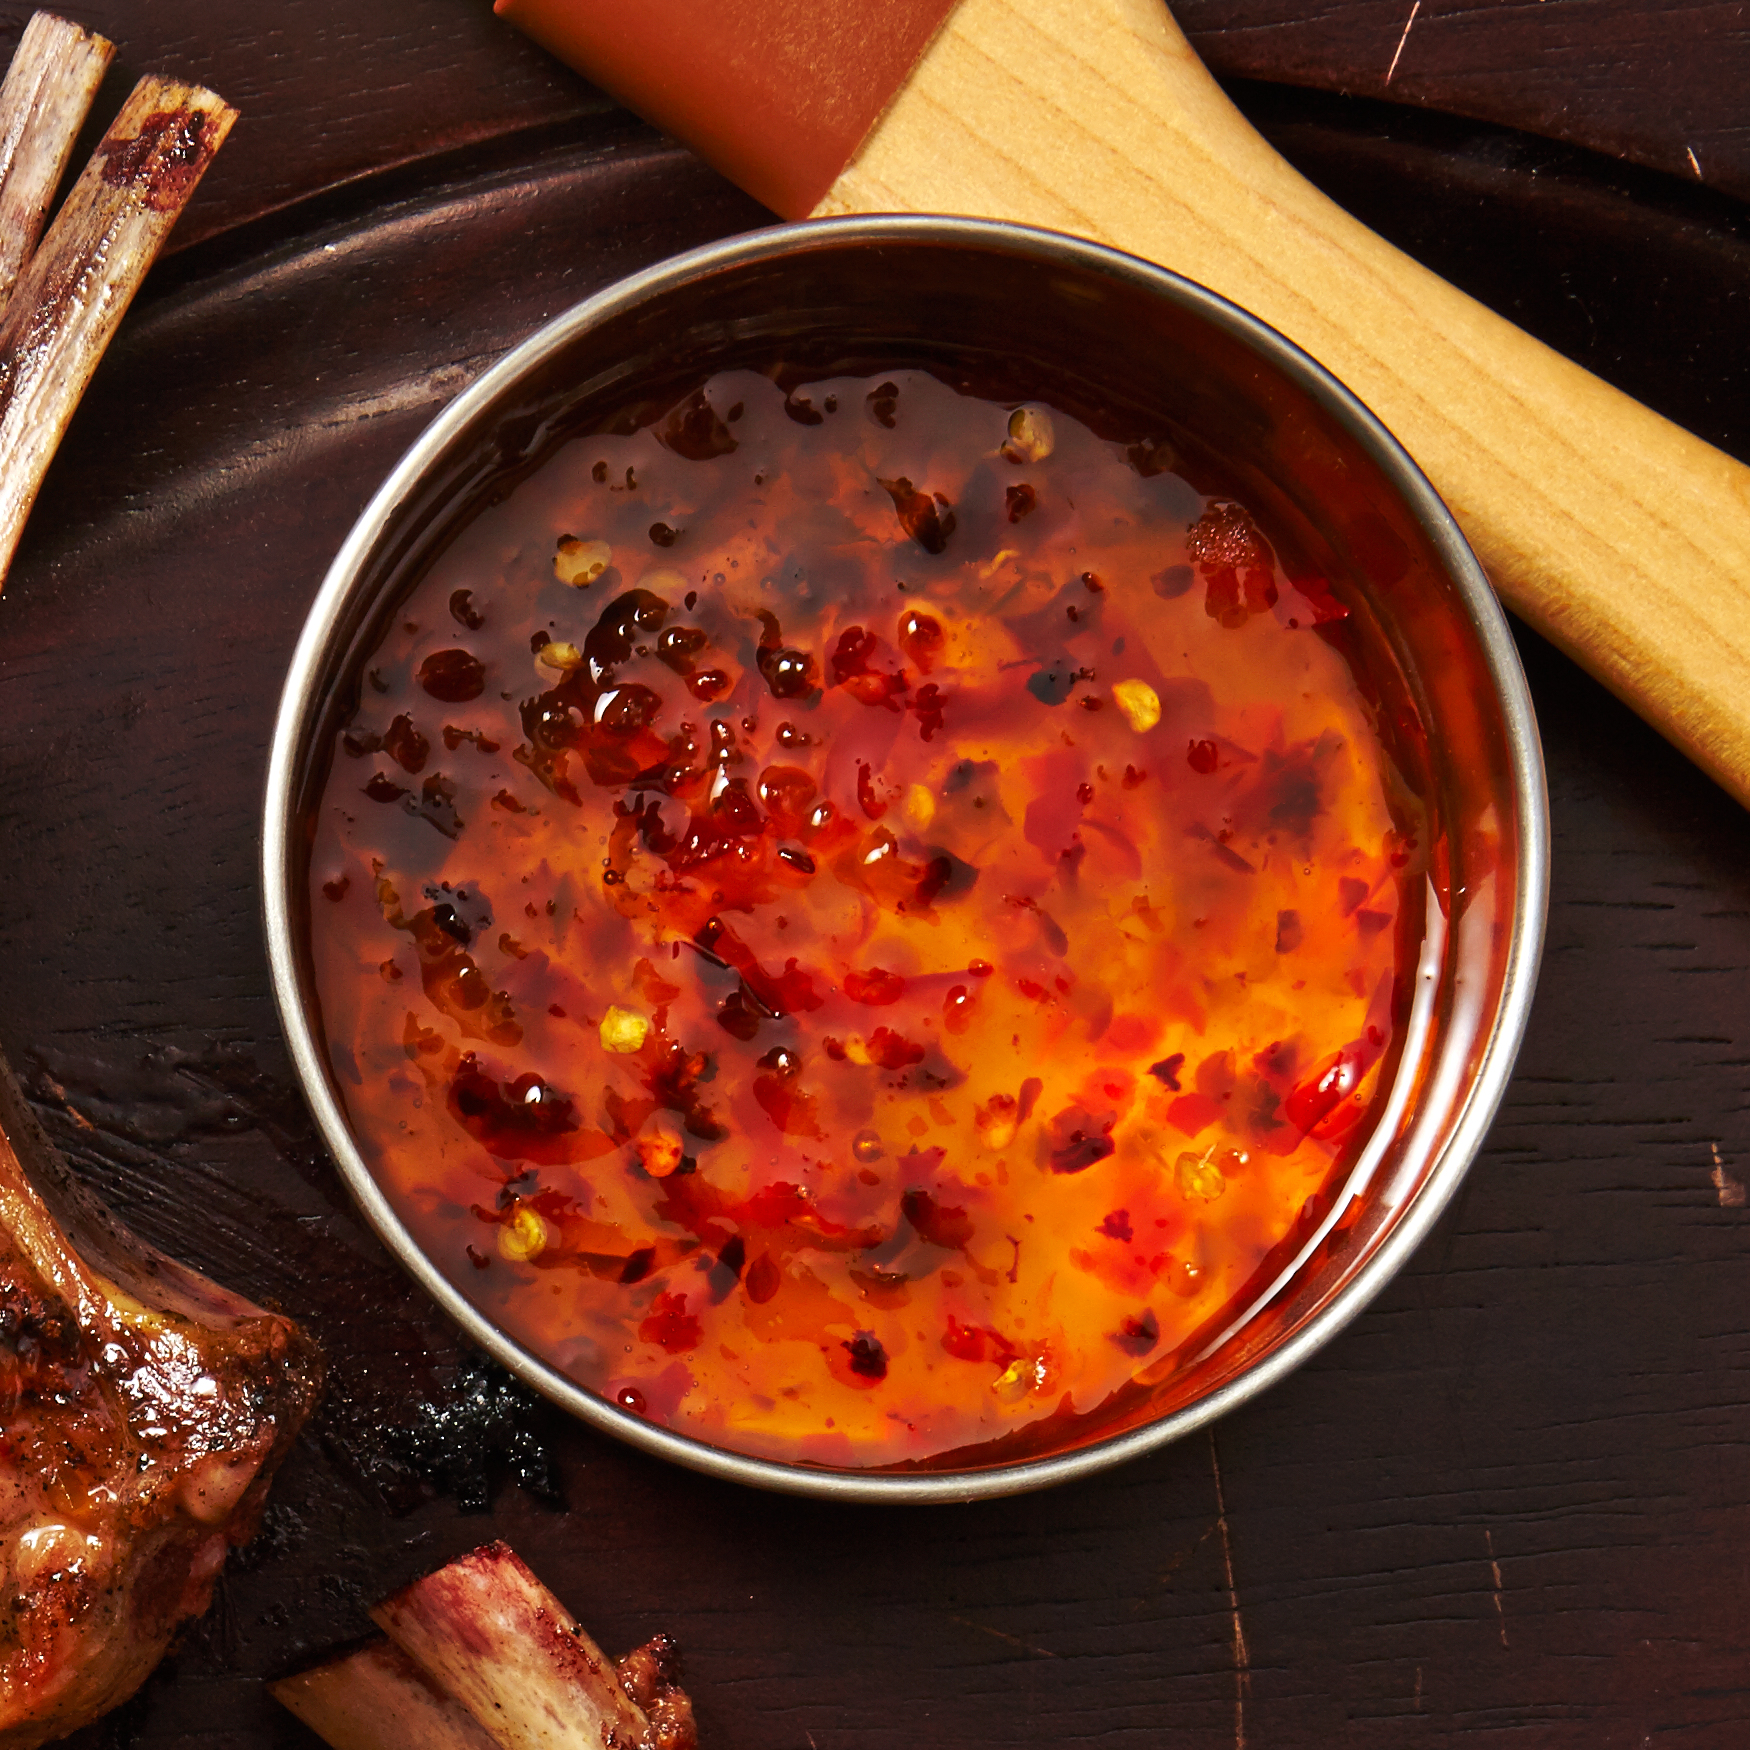 Hot Pepper Jelly Sauce